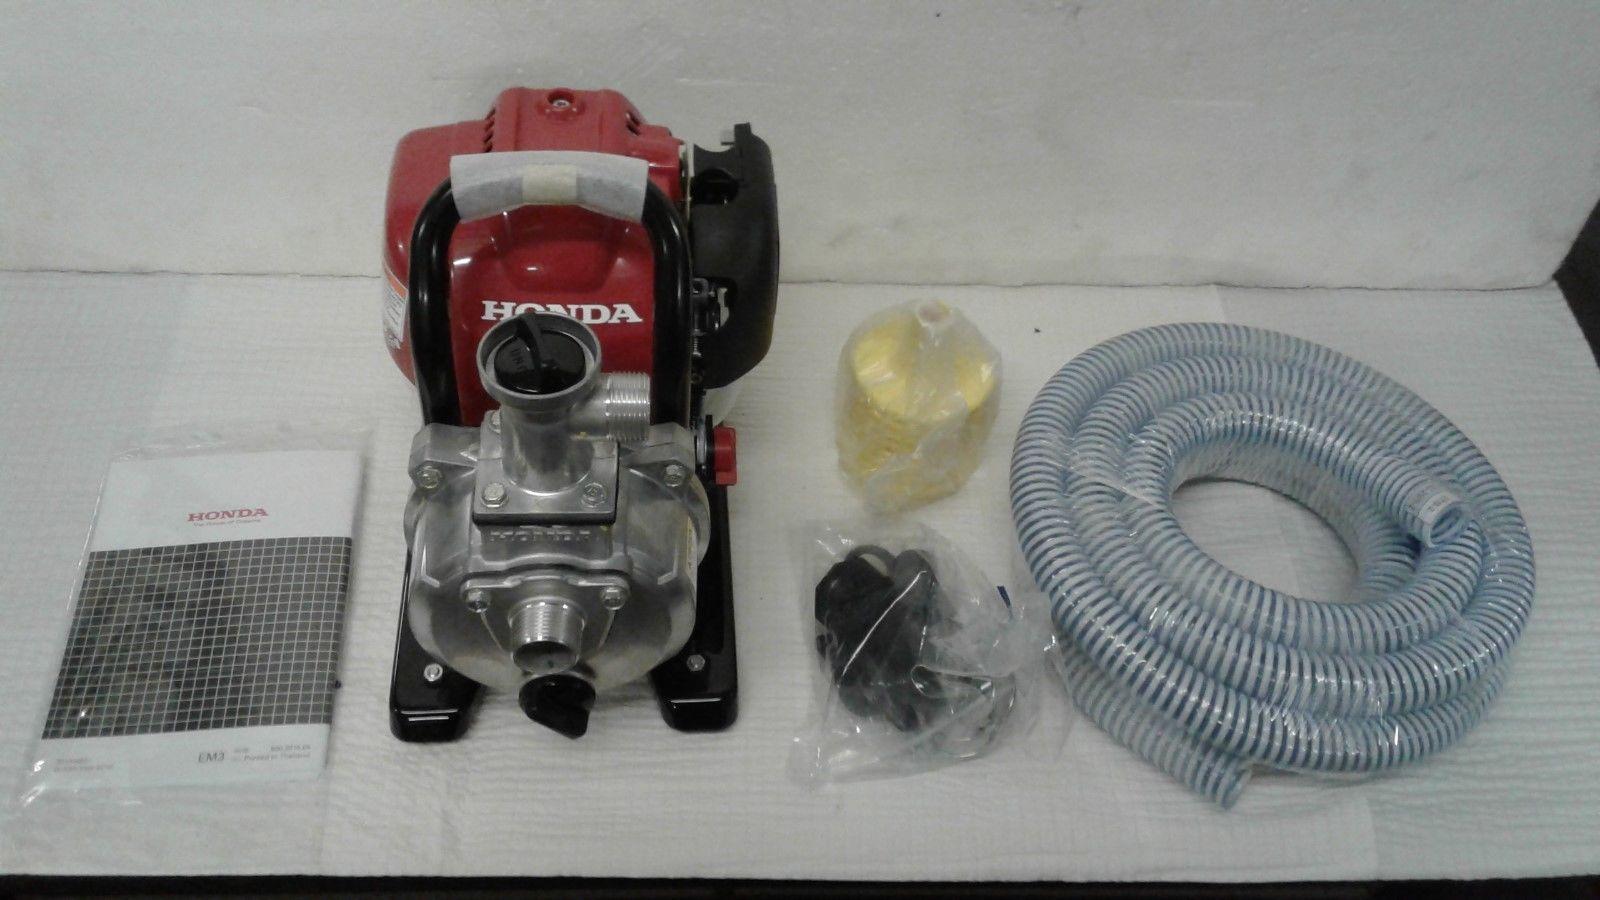 Honda Self-Priming Water Pump- 2220 GPH, 1in  Ports, 25cc Honda GX25  4-Stroke